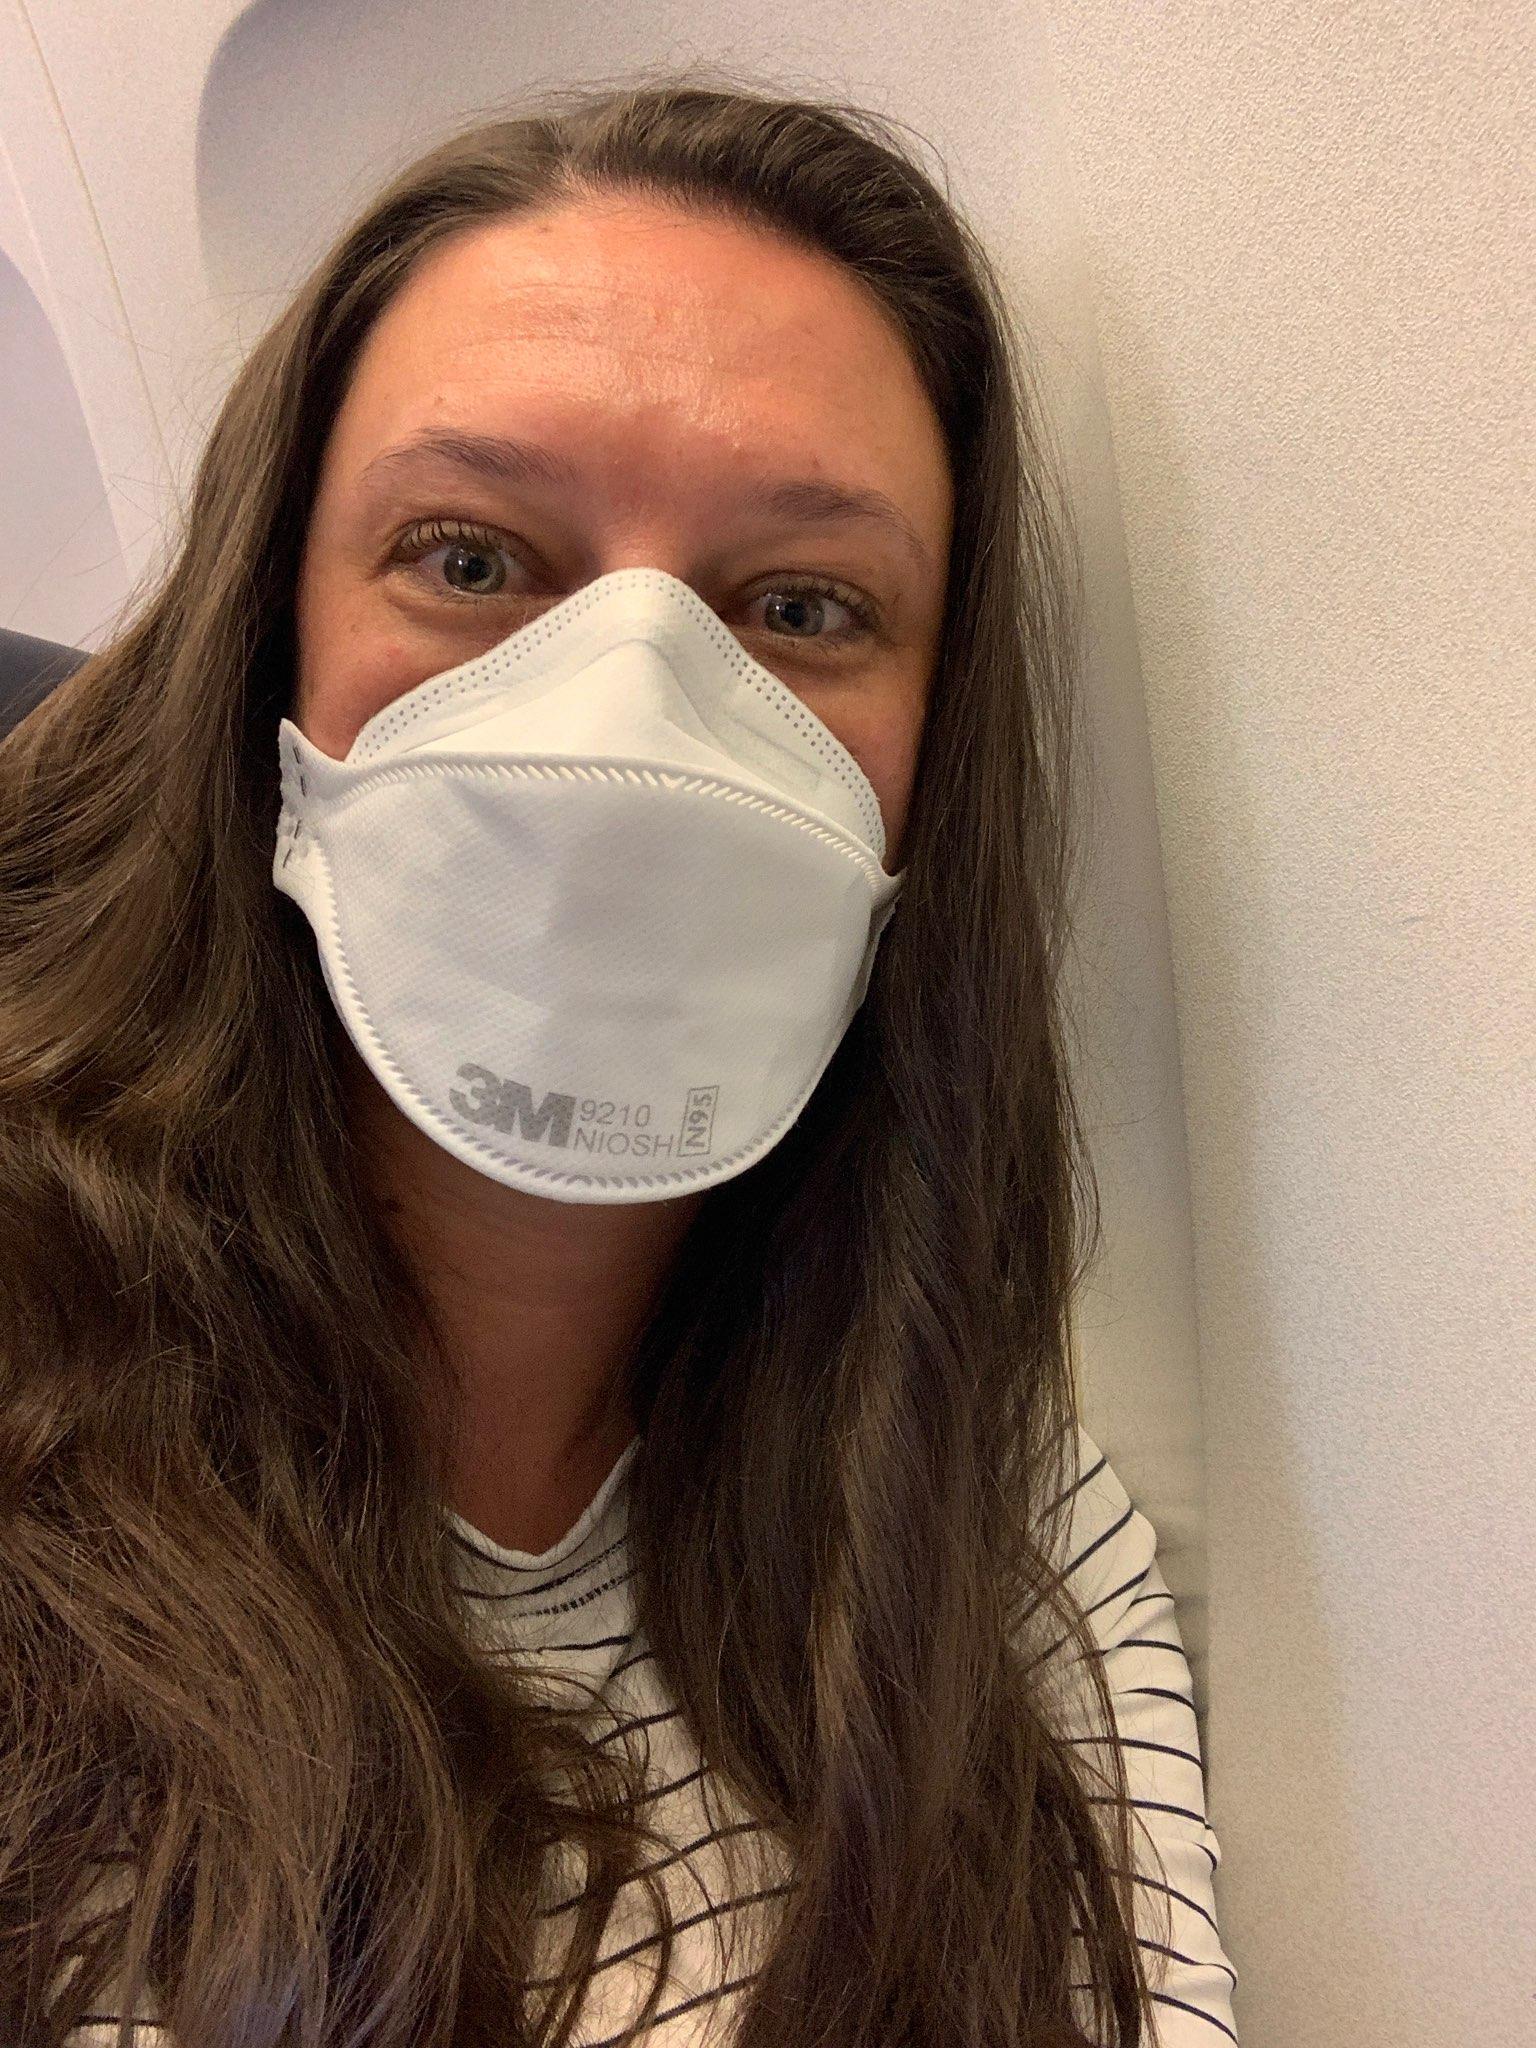 Christa Hyson wears an N-95 mask